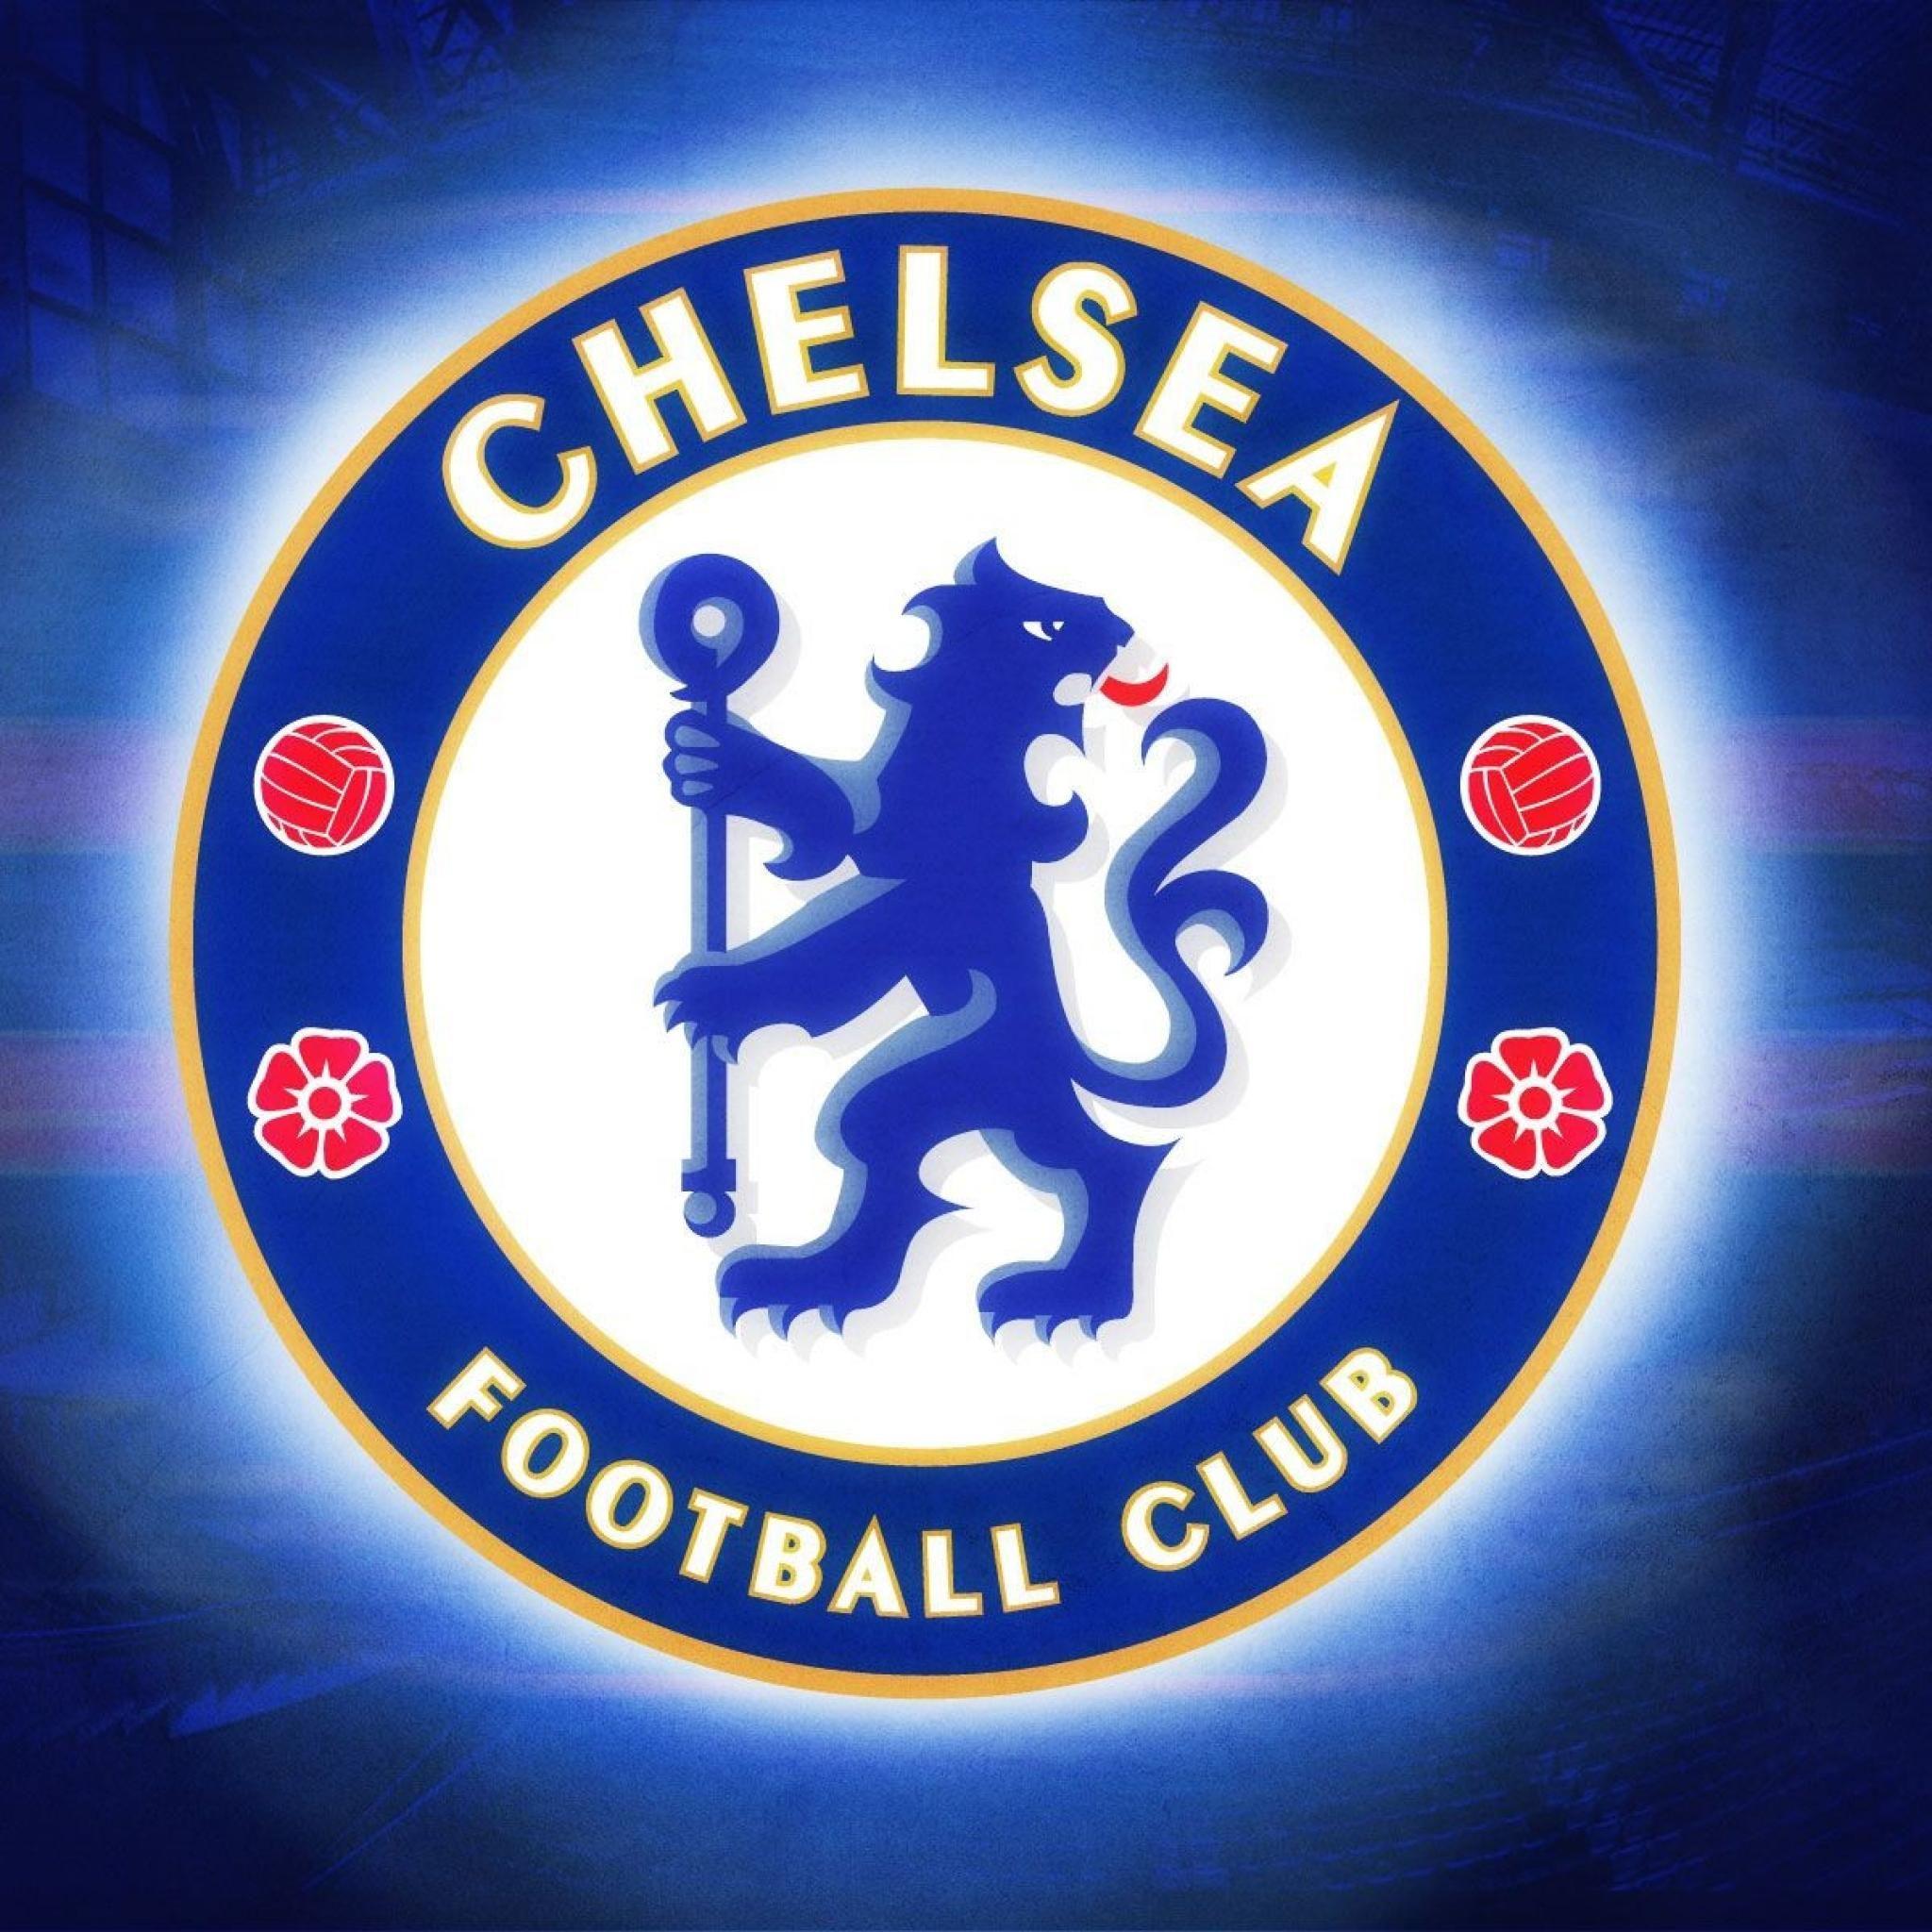 Chelsea Fc Logo Free Large Images Chelsea Fc Chelsea Olahraga Dan Desain Logo